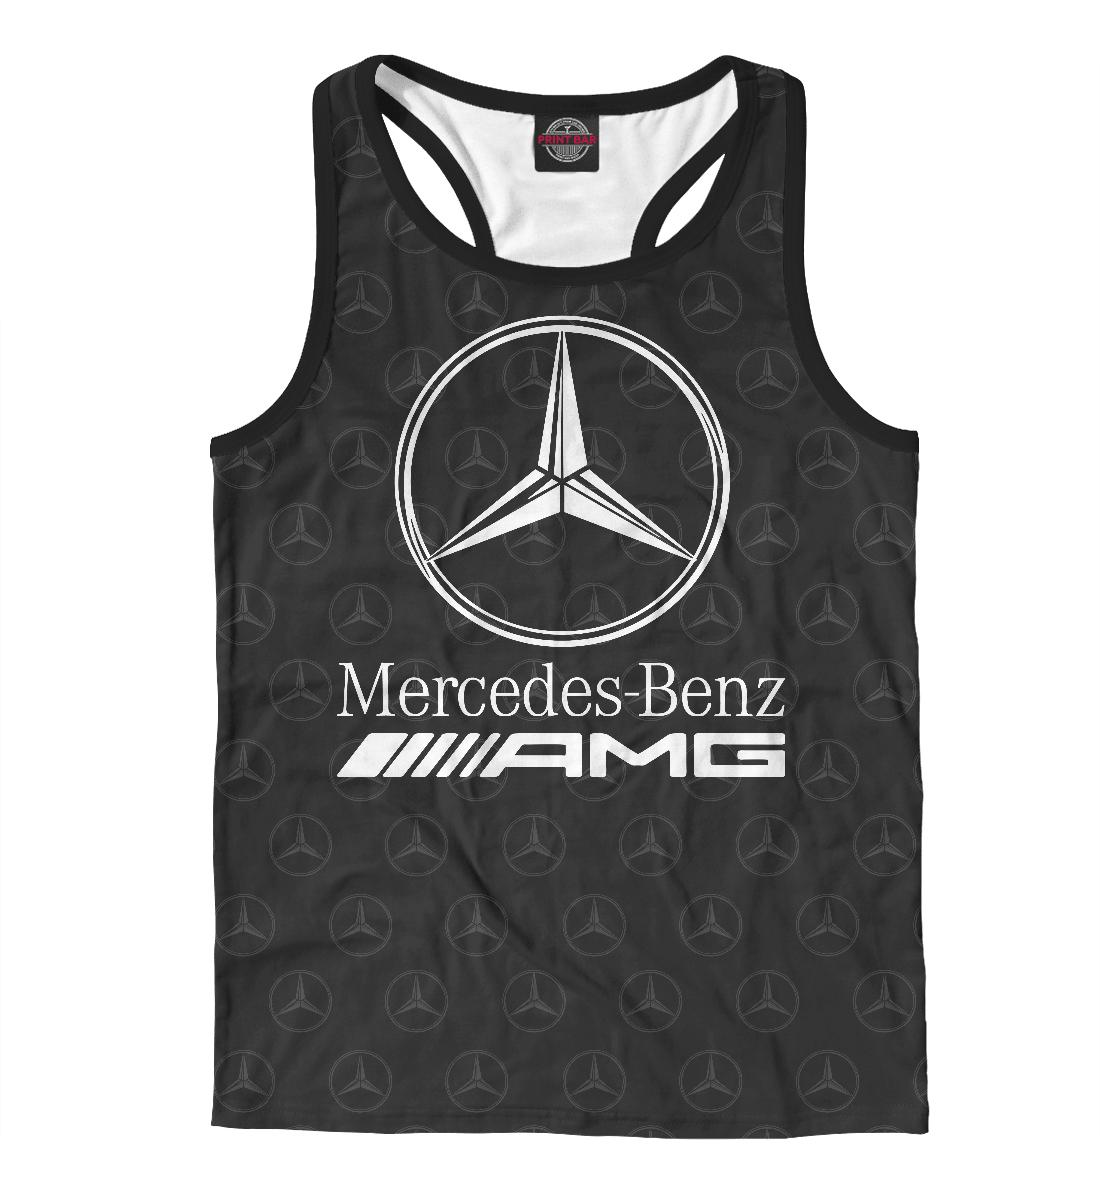 Купить Mercedes-Benz AMG Premium, Printbar, Майки борцовки, MER-425413-mayb-2